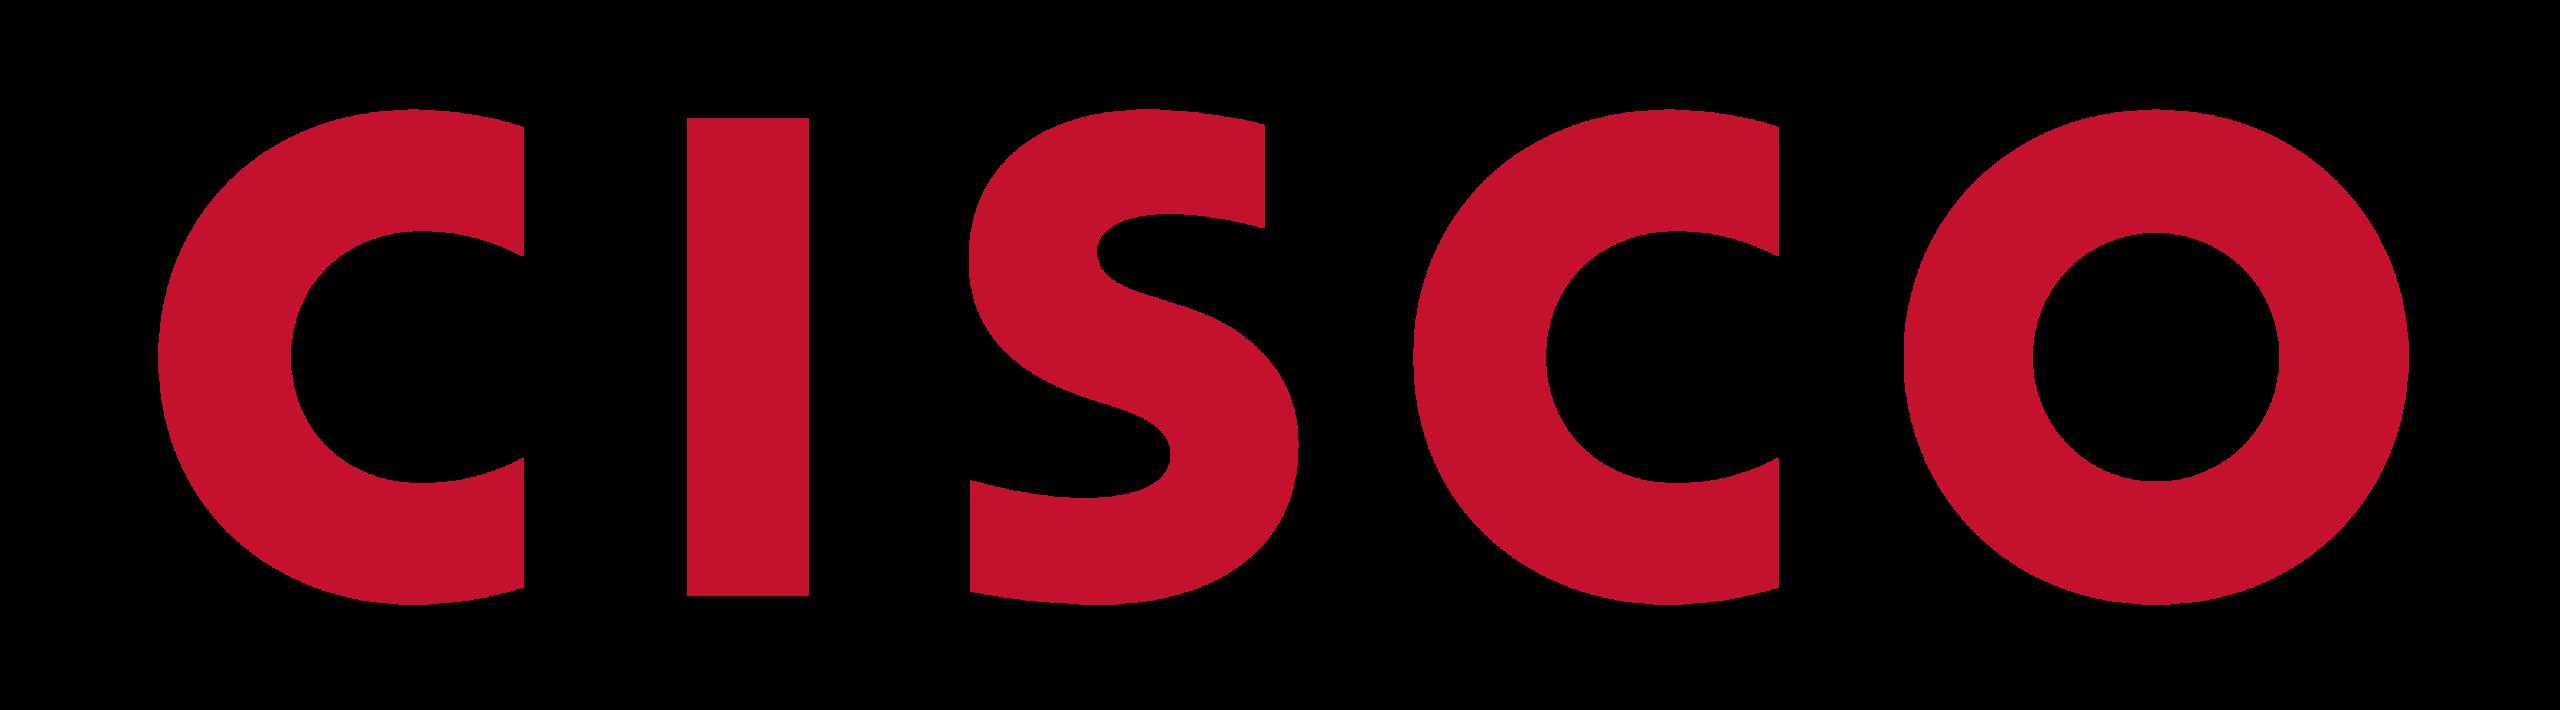 OSitservice - Chicago - IT service - Managed IT